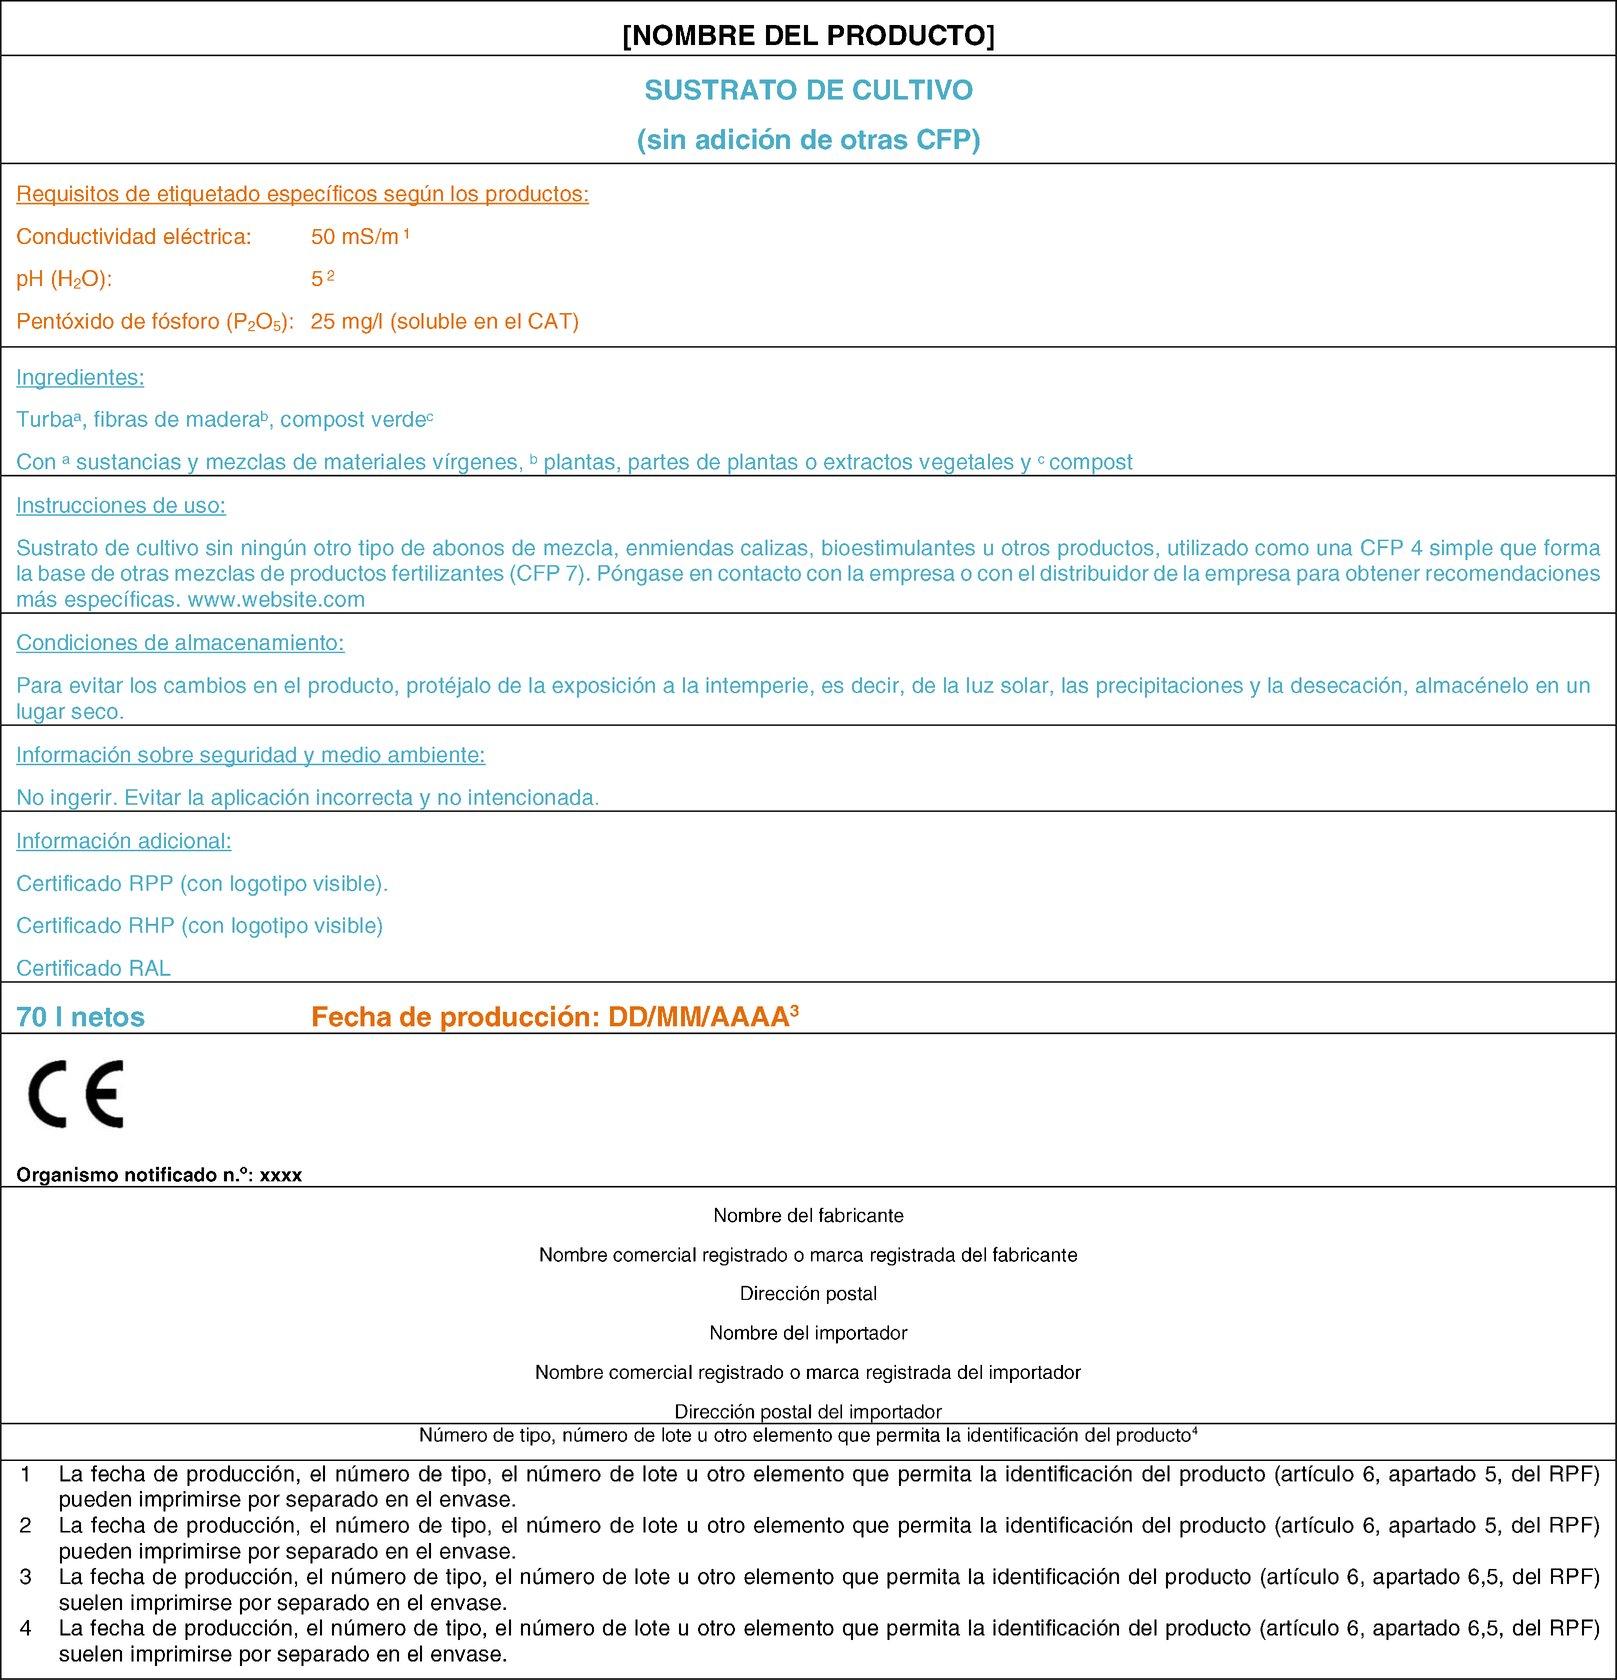 Imagen: http://publications.europa.eu/resource/uriserv/OJ.C_.2021.119.01.0001.01.SPA.xhtml.C_2021119ES.01003101.tif.jpg